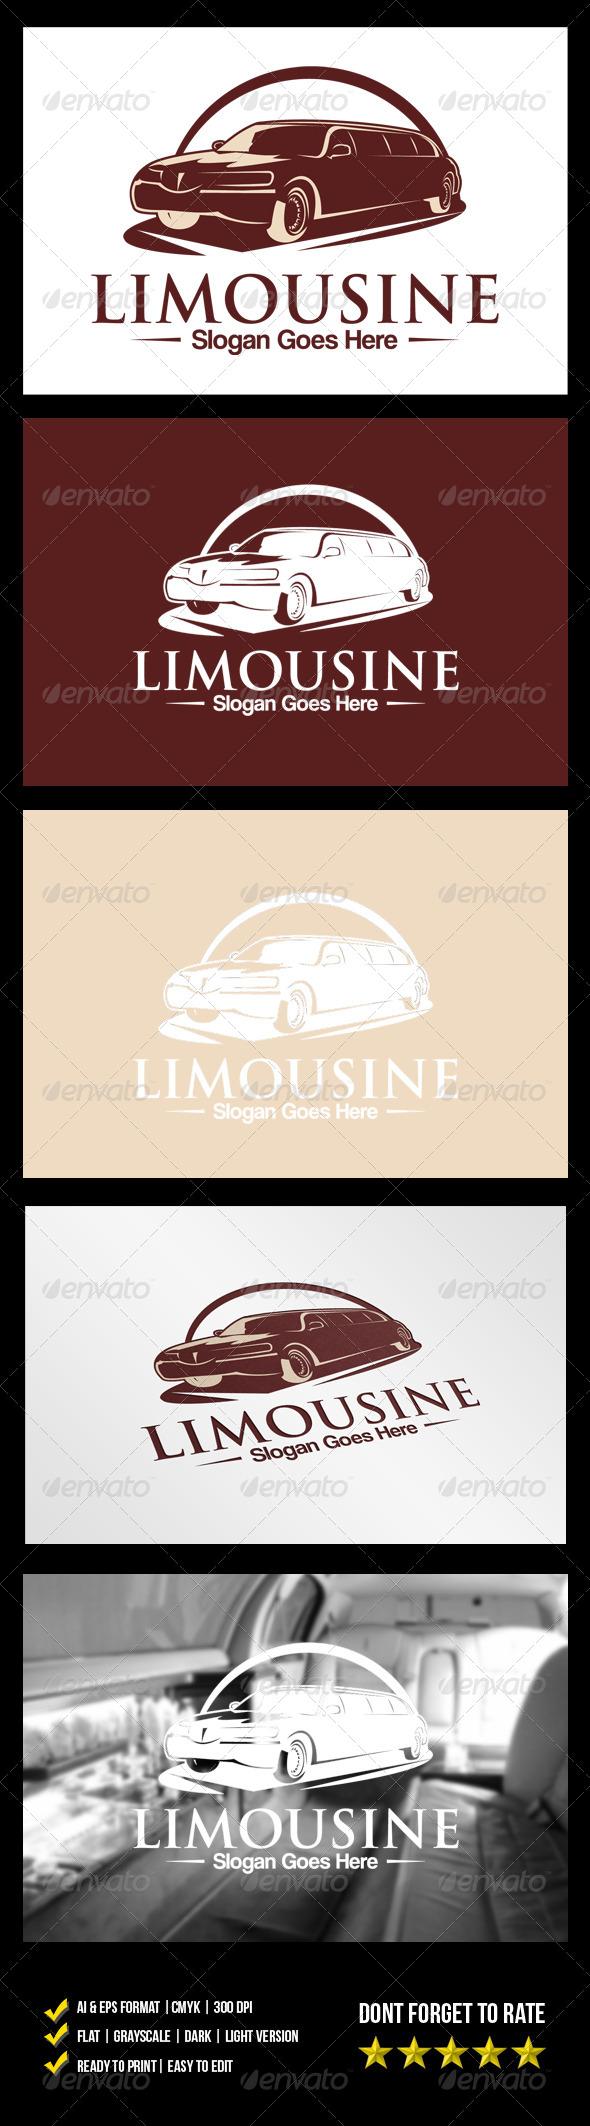 Limousine Logo - Objects Logo Templates